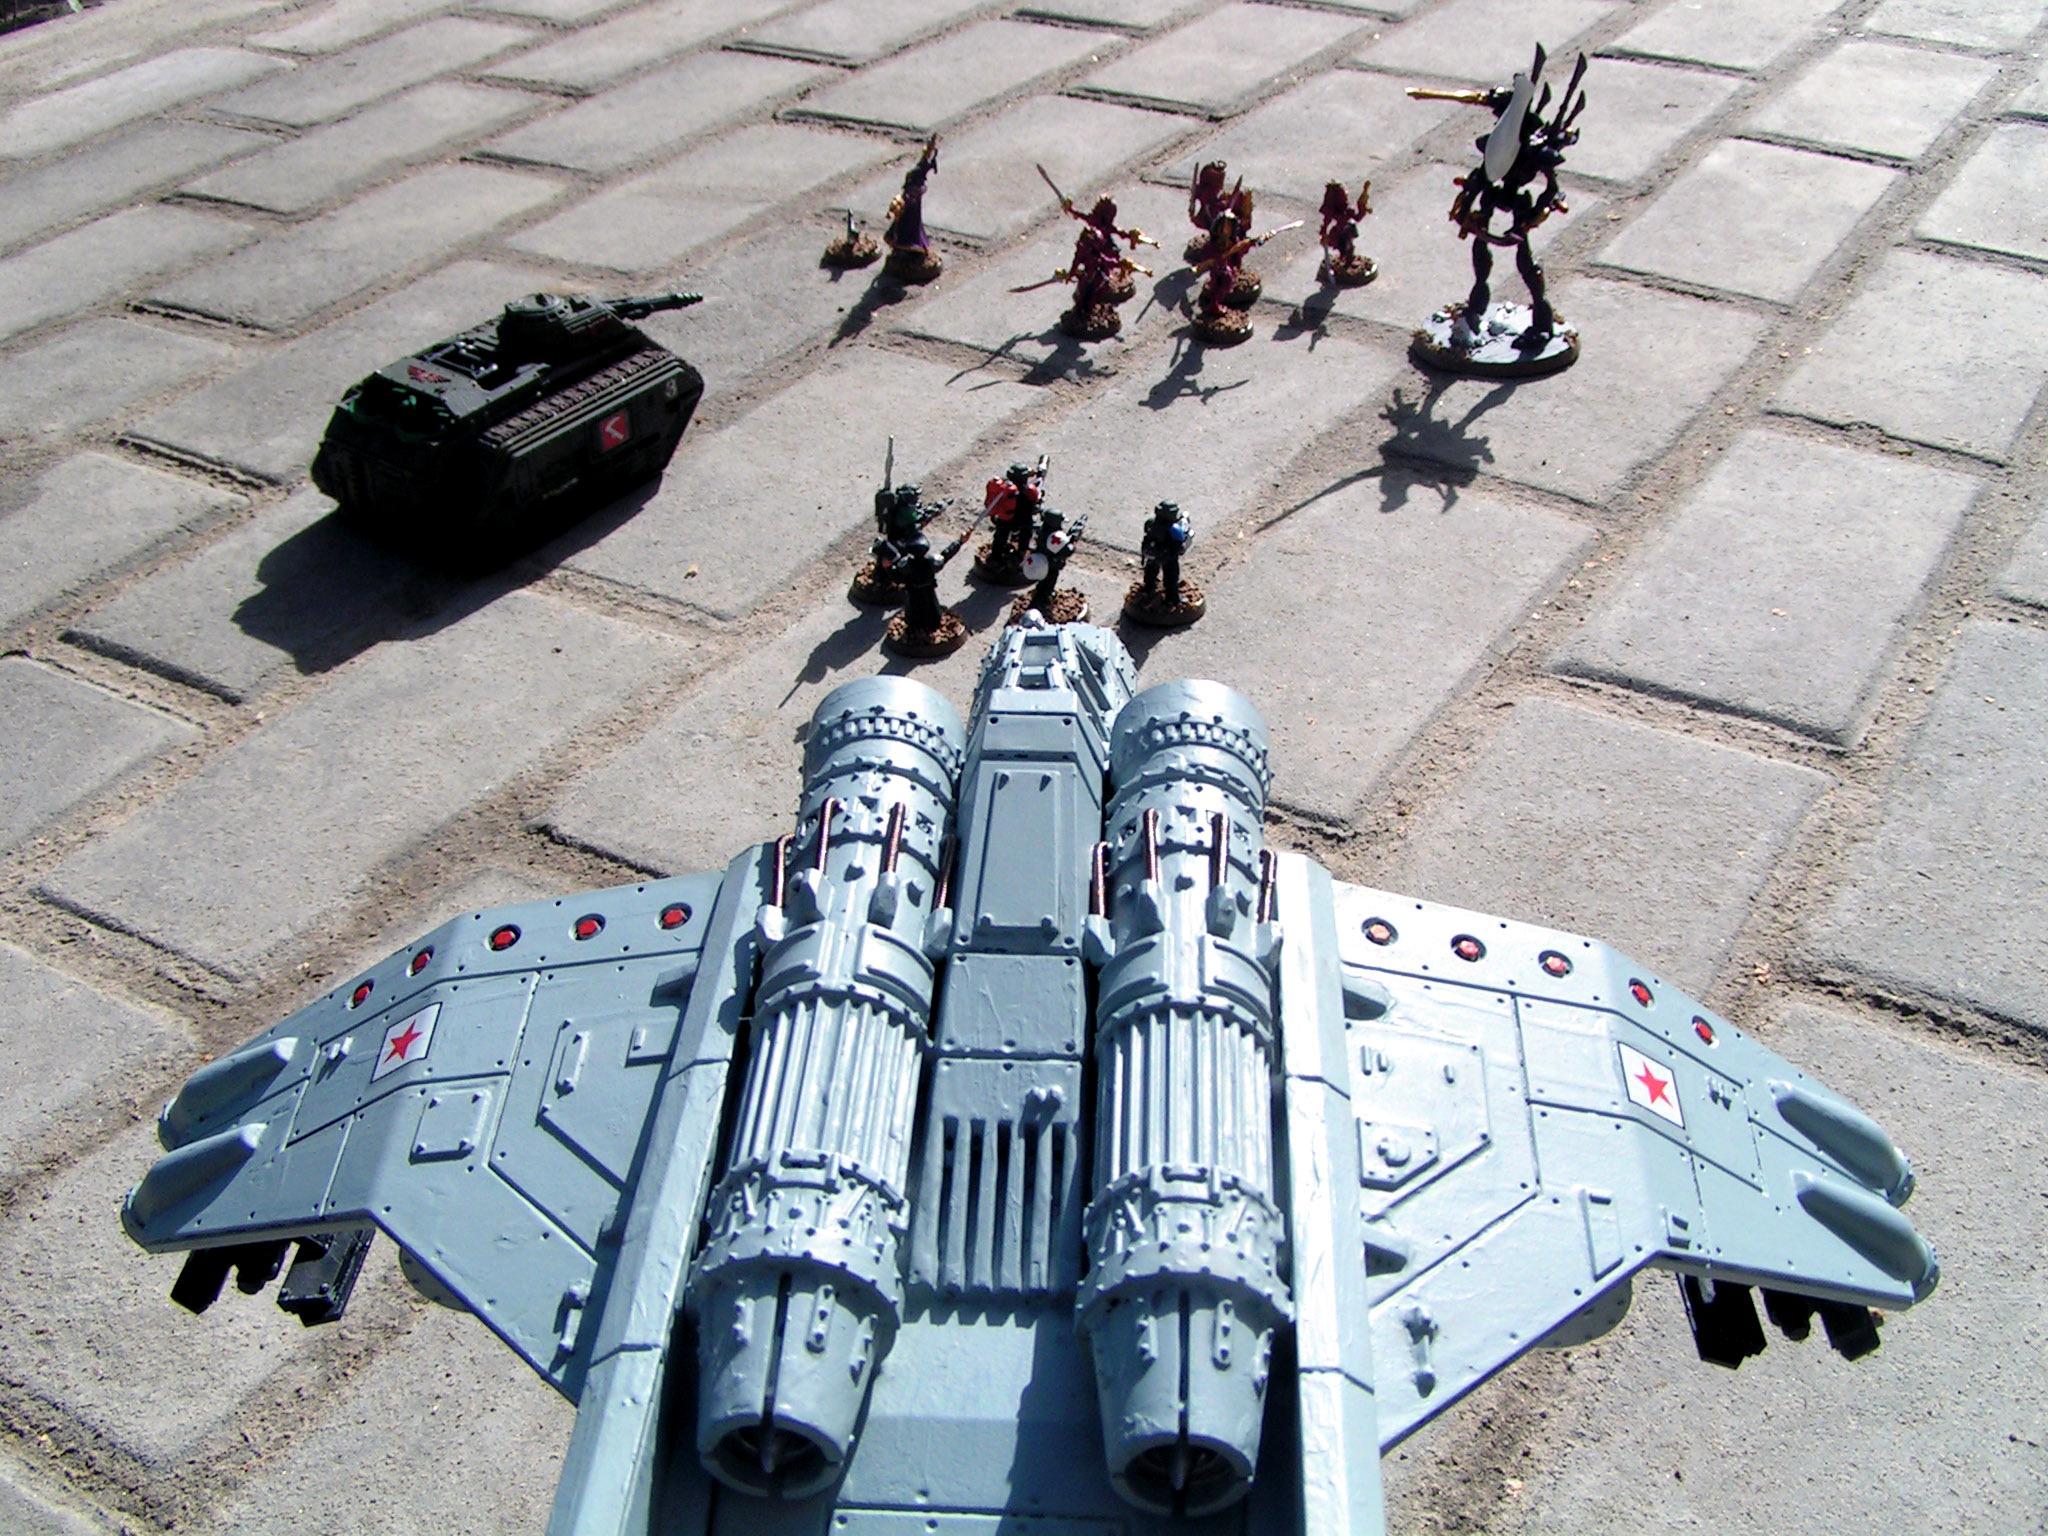 Astra Militarum, Eldar Abuse, Imperial Guard, Valkyrie